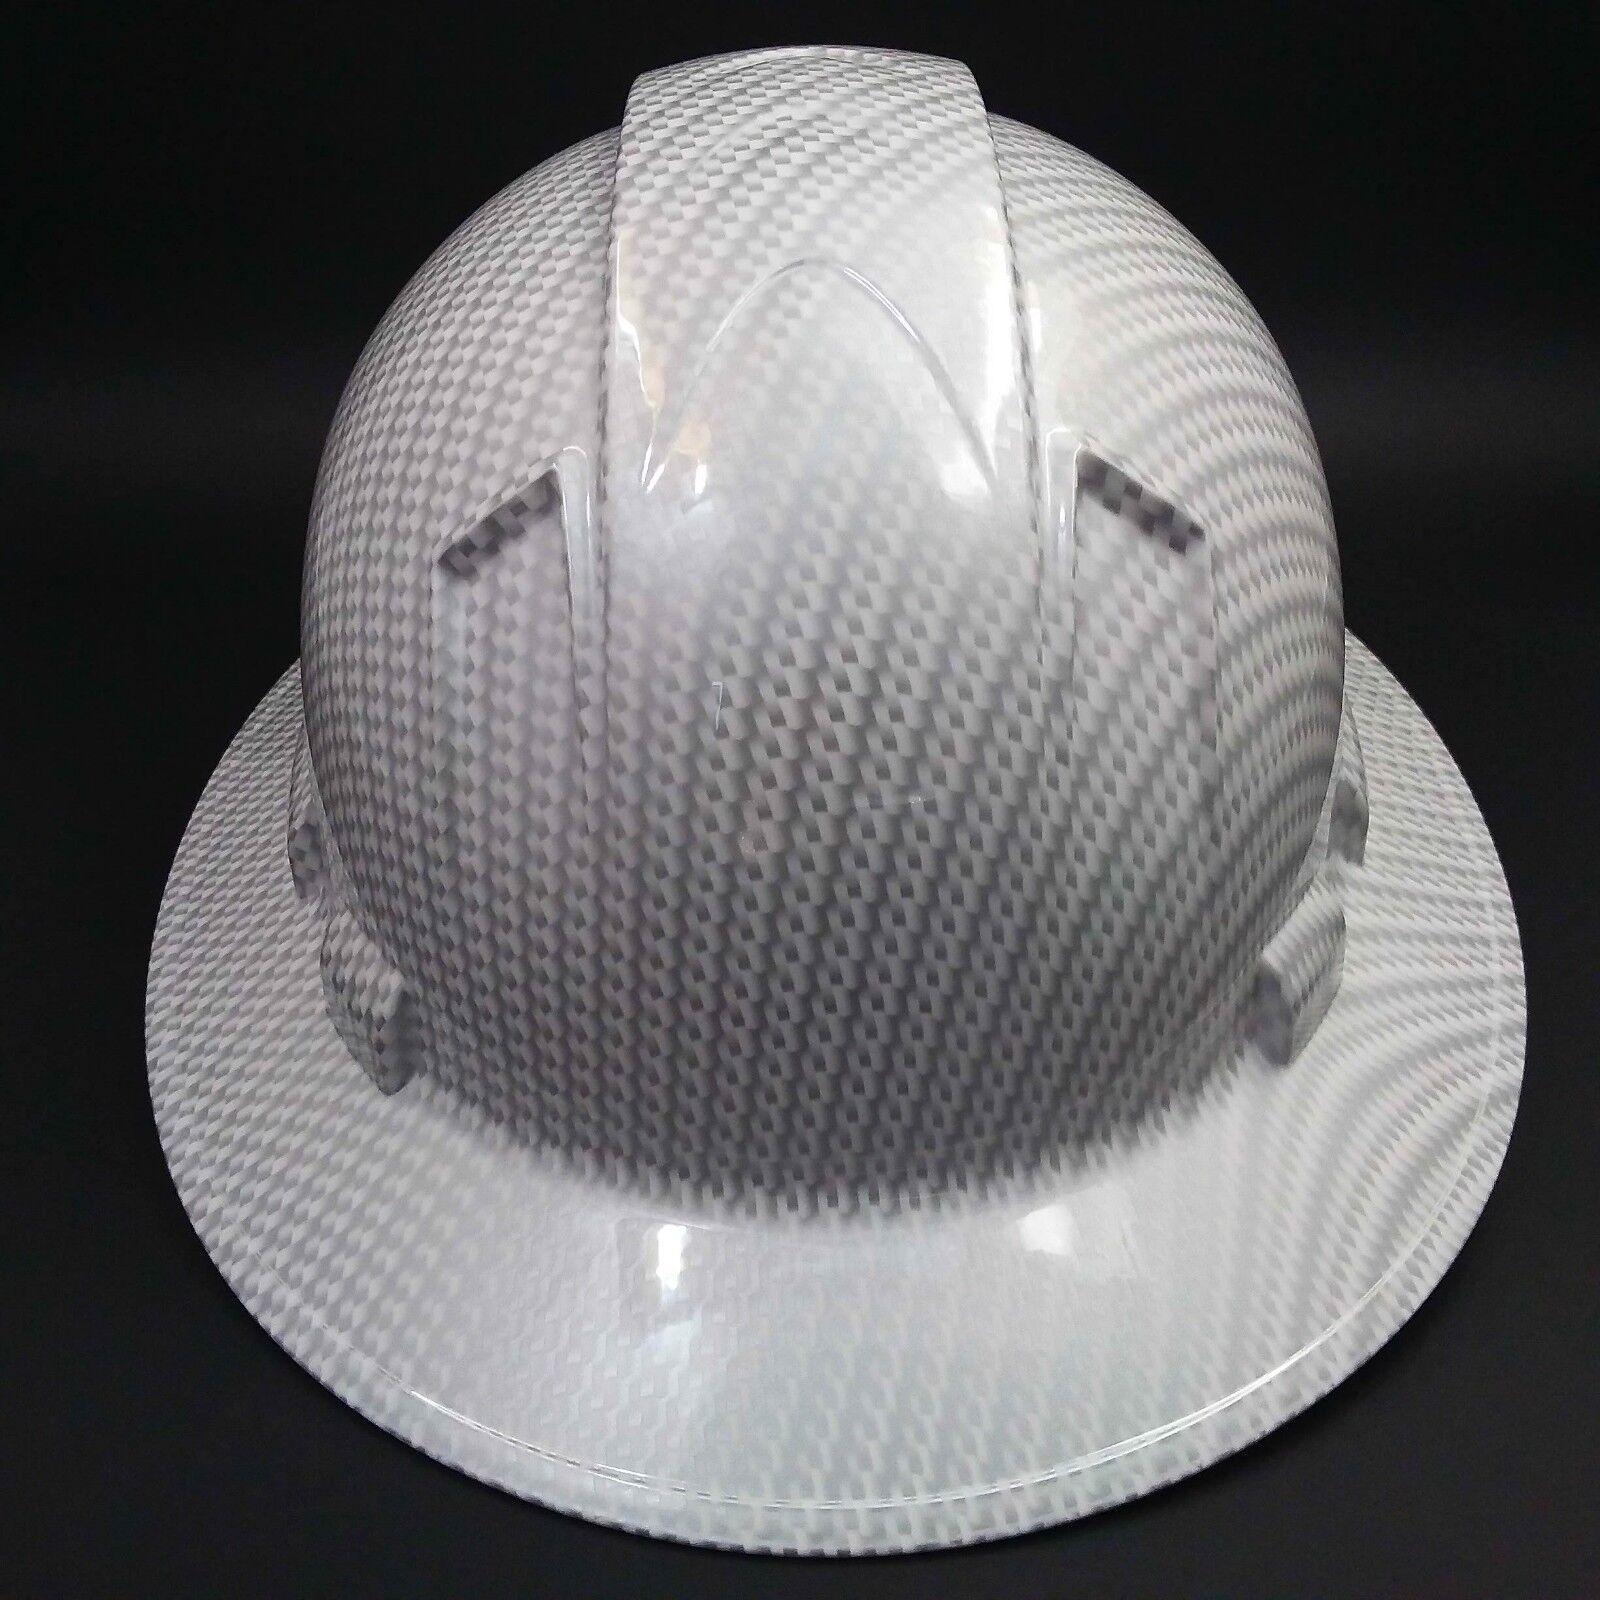 FULL BRIM Hard Hat custom hydro dipped , NEW WHITE CARBON FIBER HOT NEW HYDRO 4